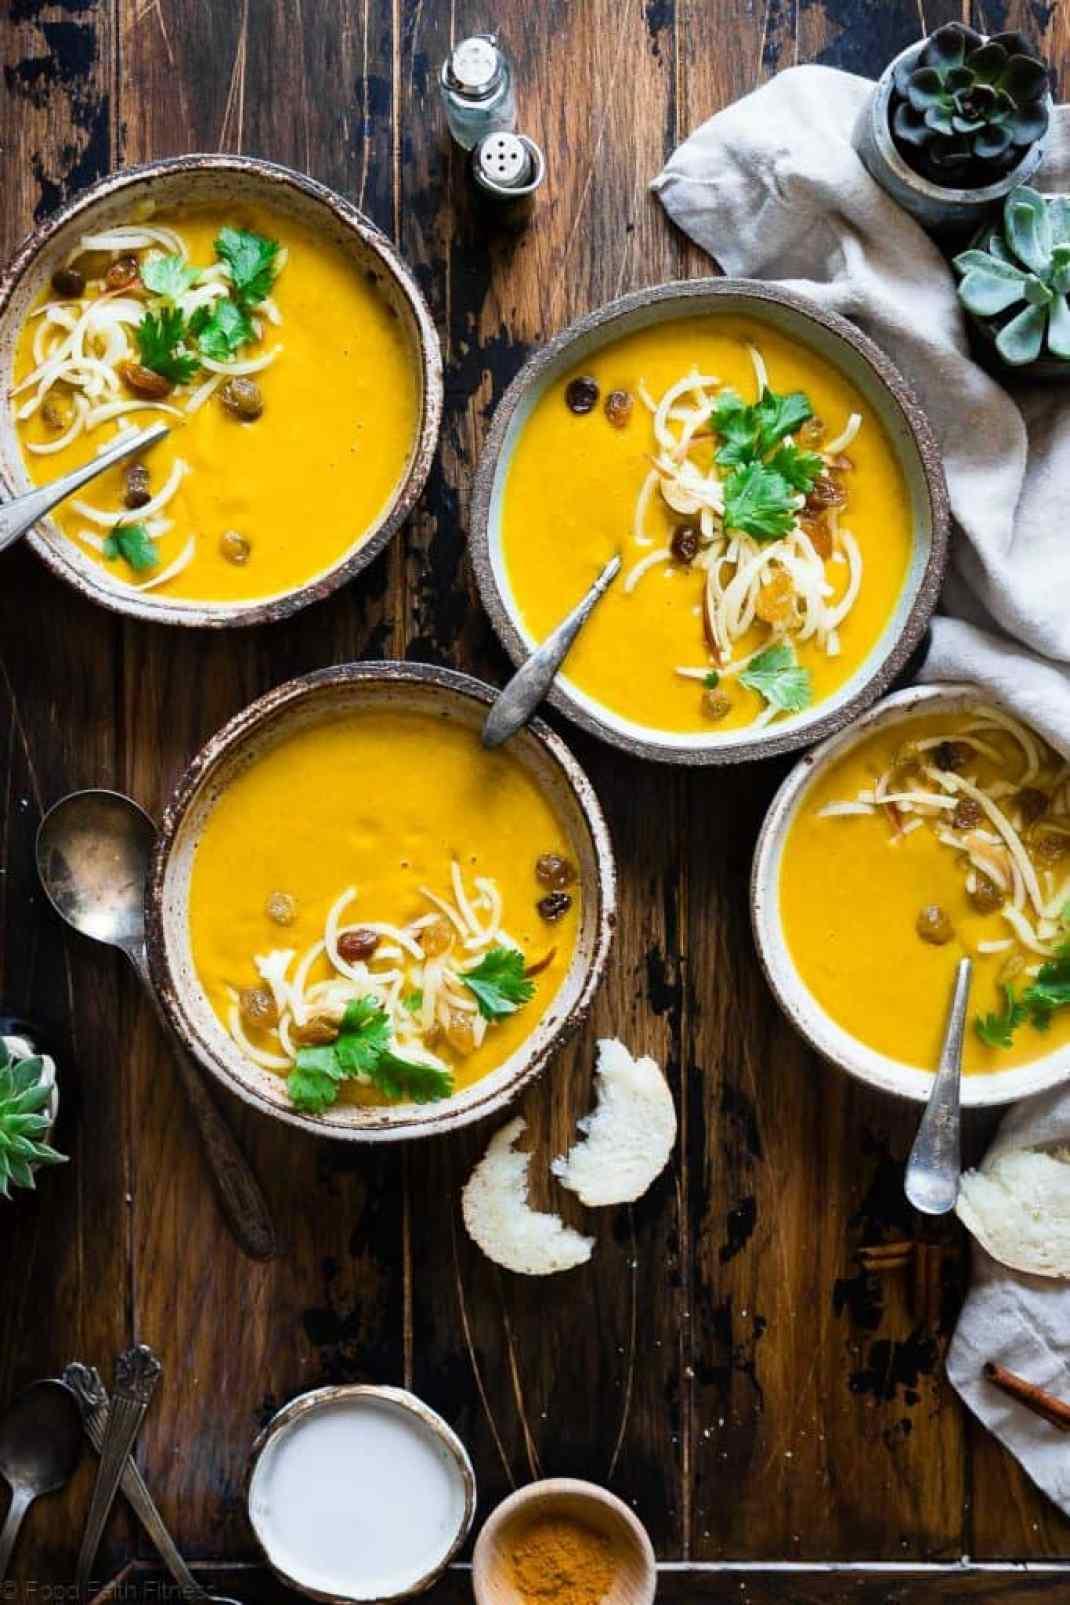 10 Must-Make Crockpot Soup Recipes